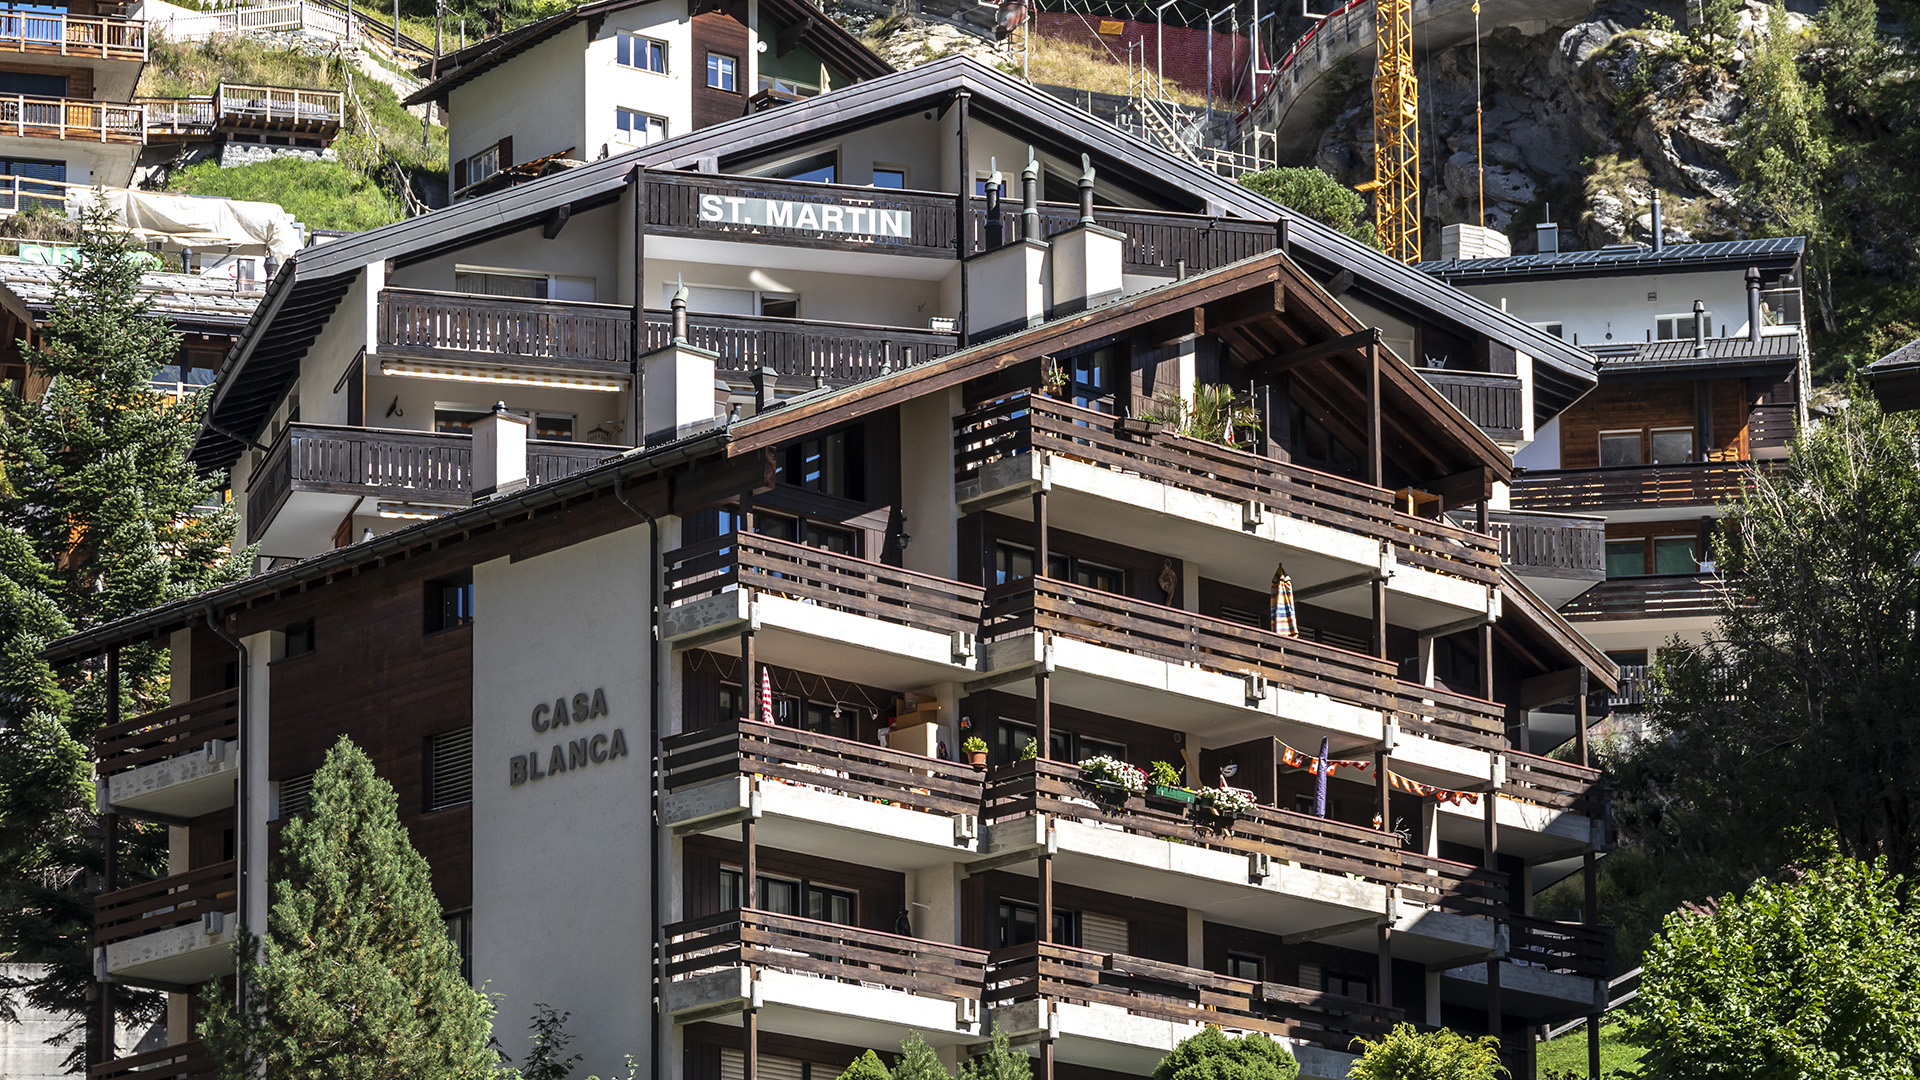 St Martin Apartments, Switzerland